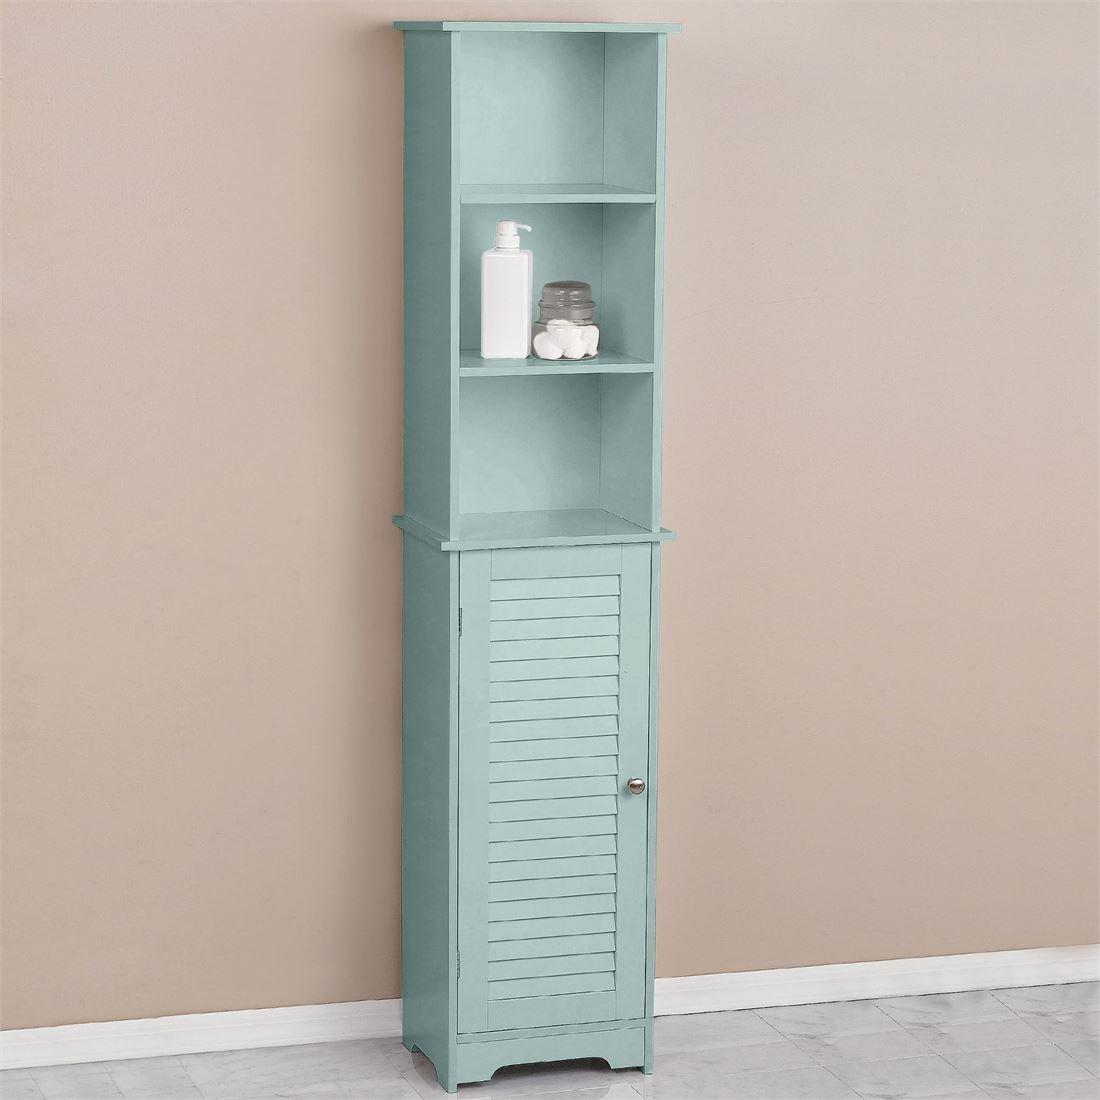 Amazon.com: BrylaneHome Louvre Tall Cabinet (Seafoam,0): Home & Kitchen